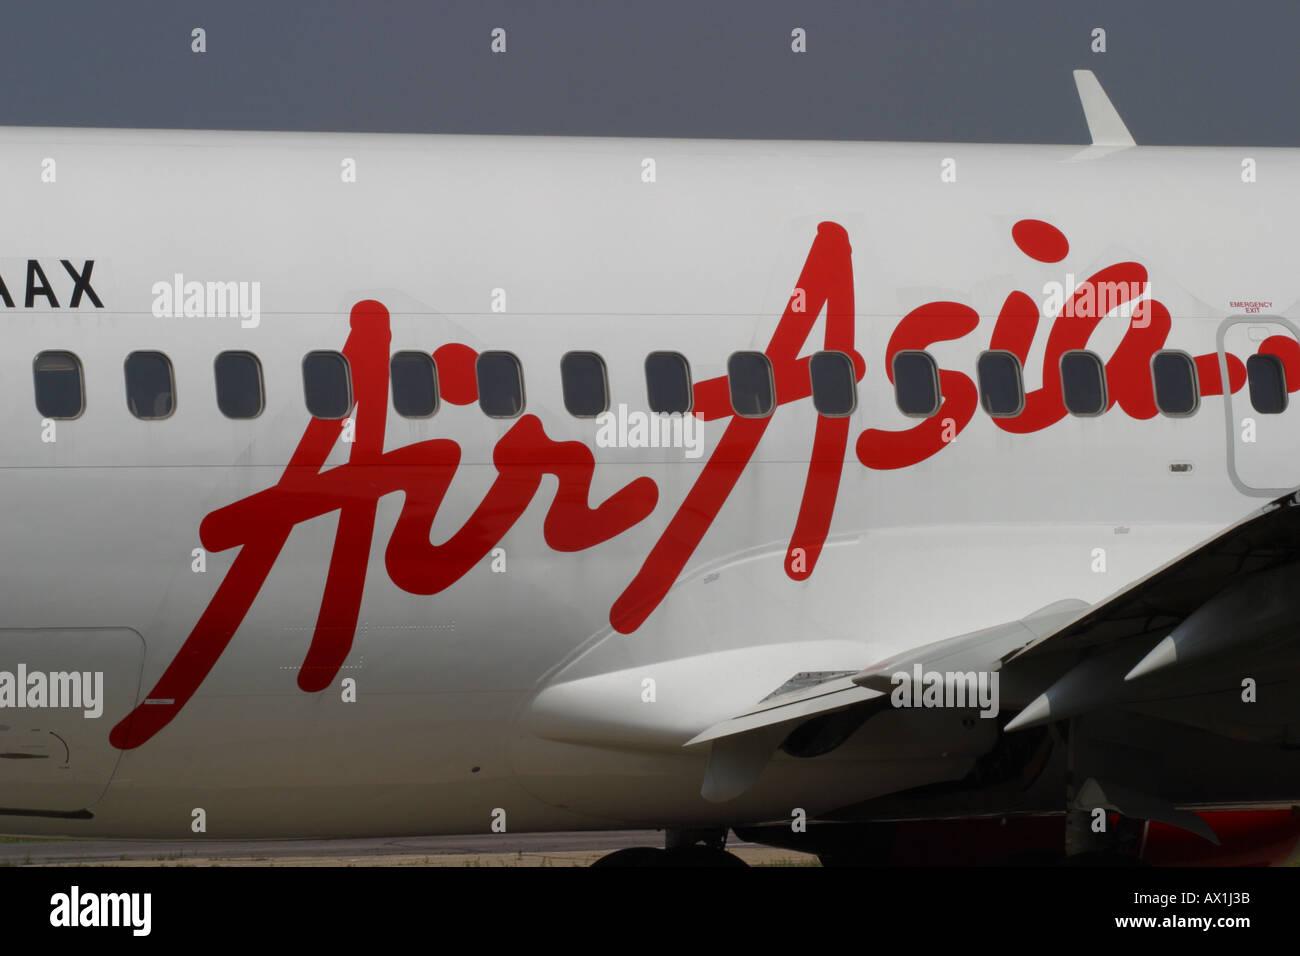 Air Asia jet passenger commercial airliner Airasia - Stock Image